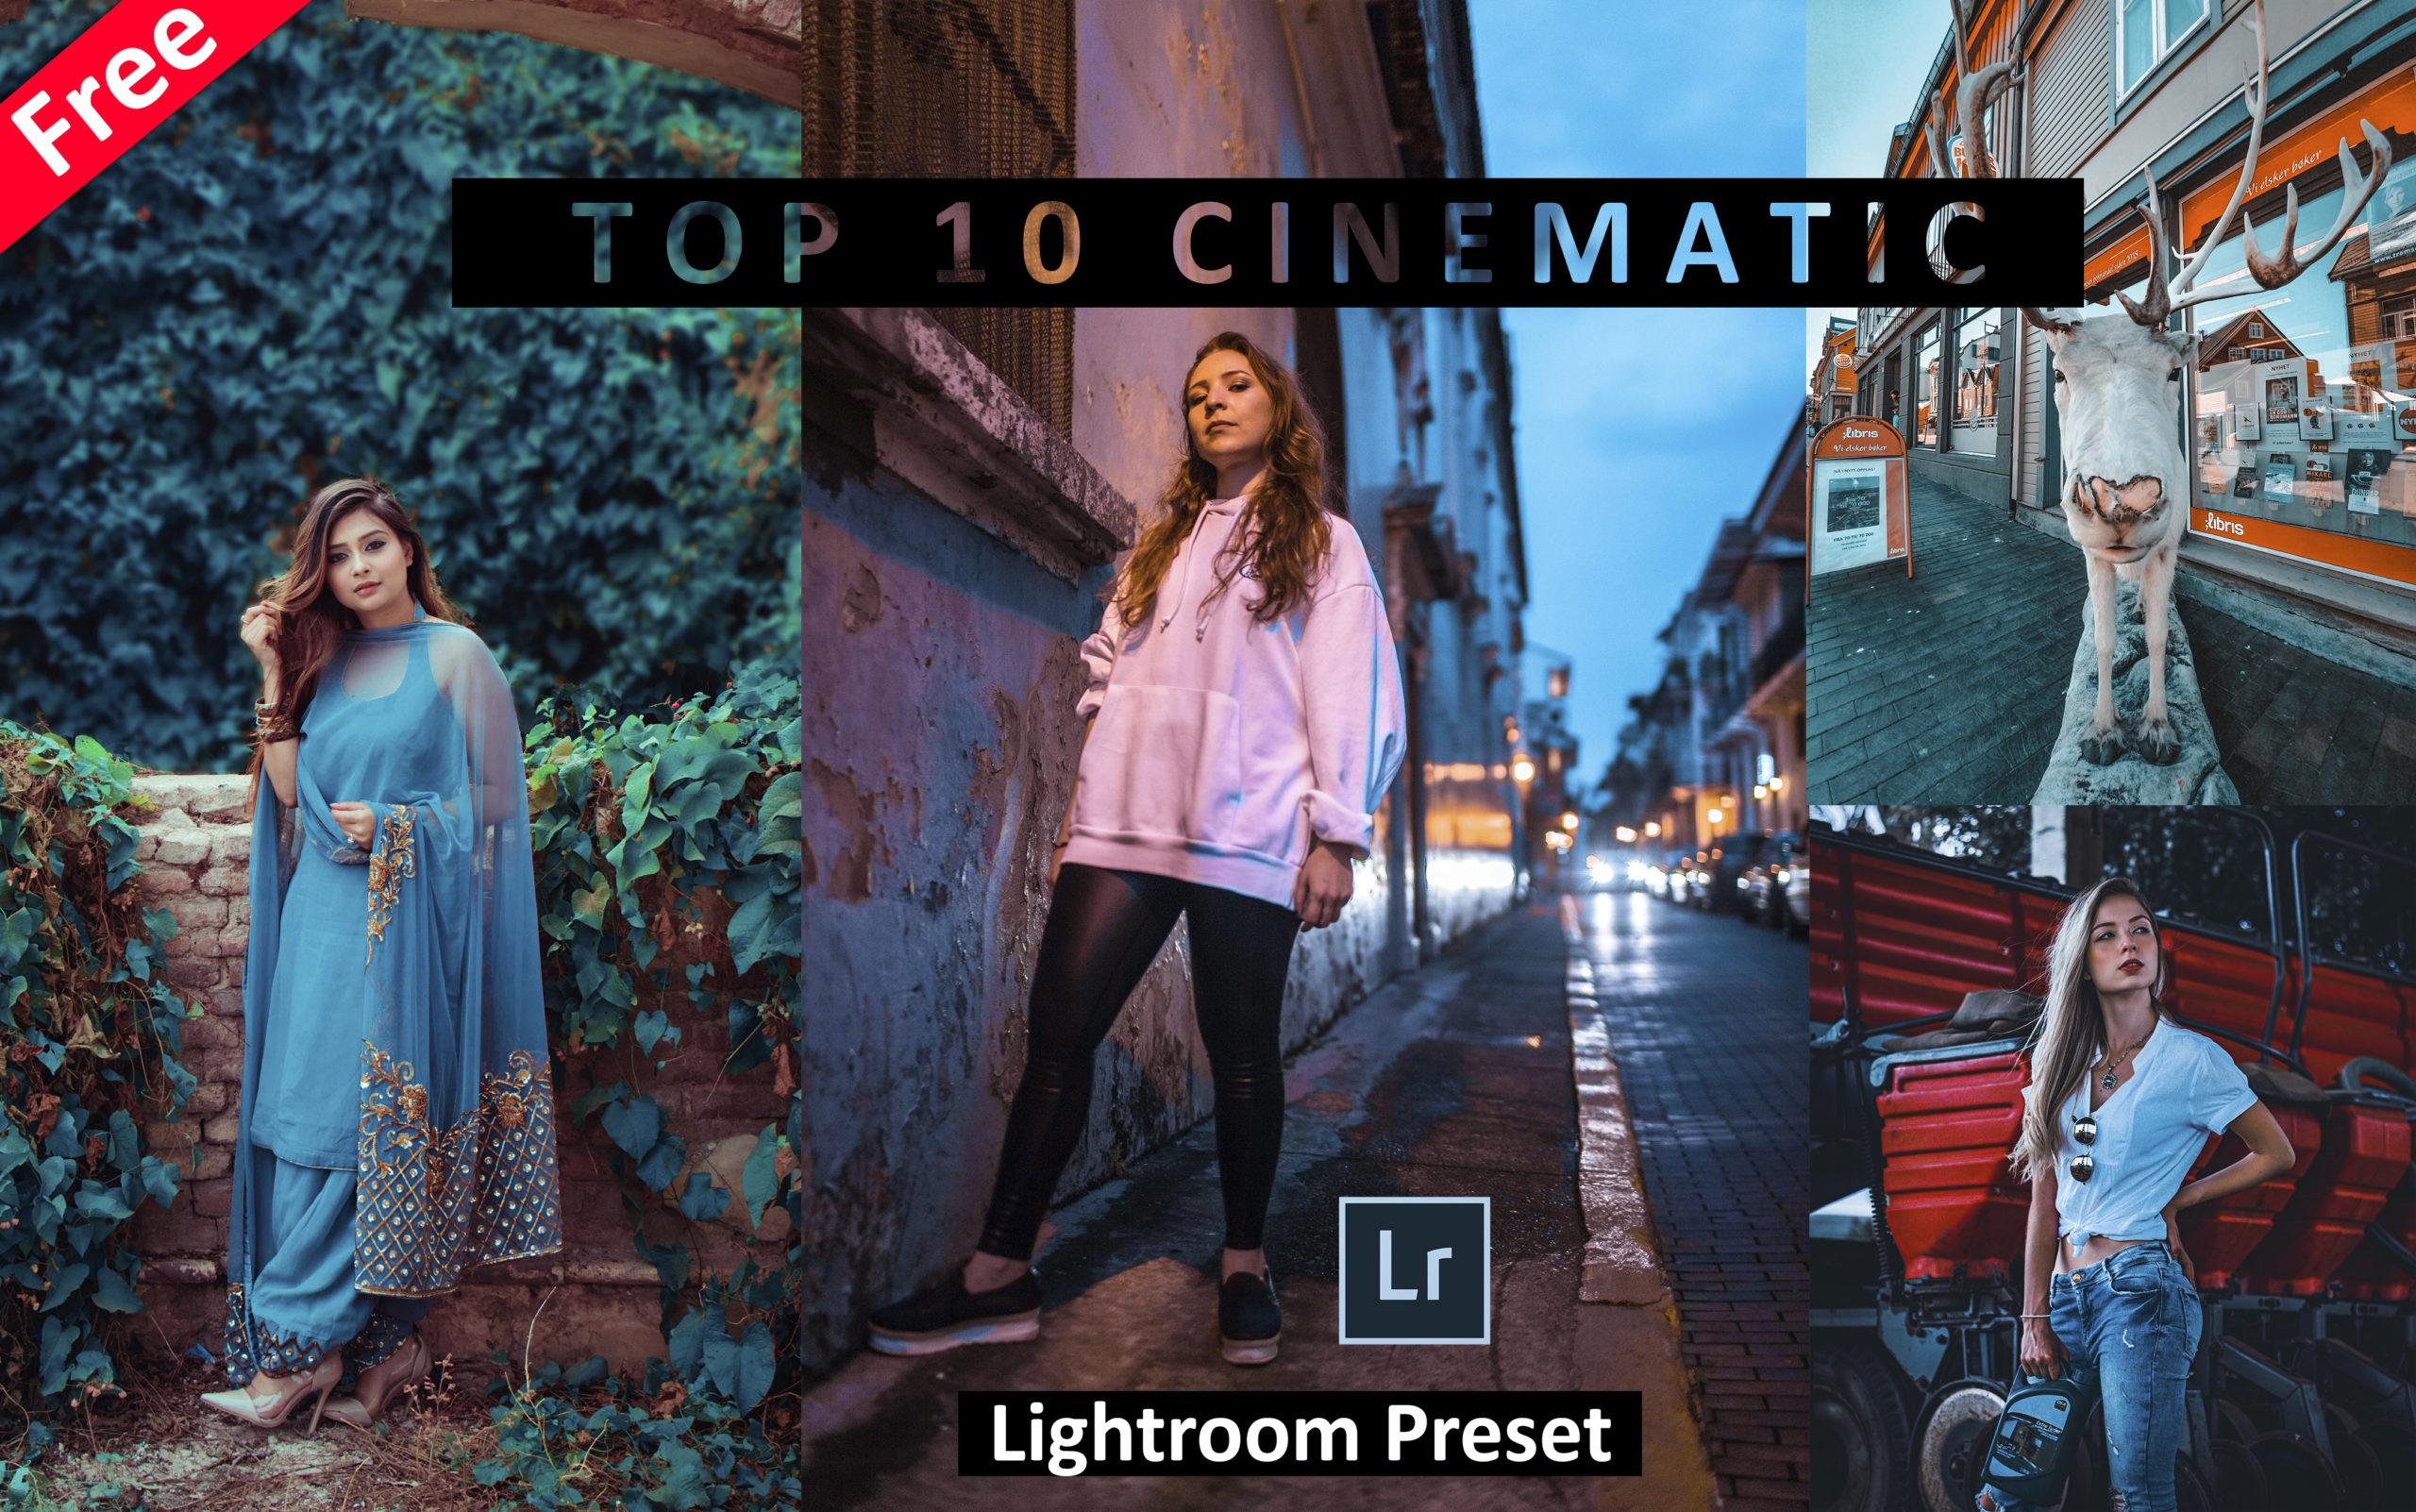 Download Top 10 CINEMATIC Lightroom Presets for Free | Cinematic Effect in Lightroom